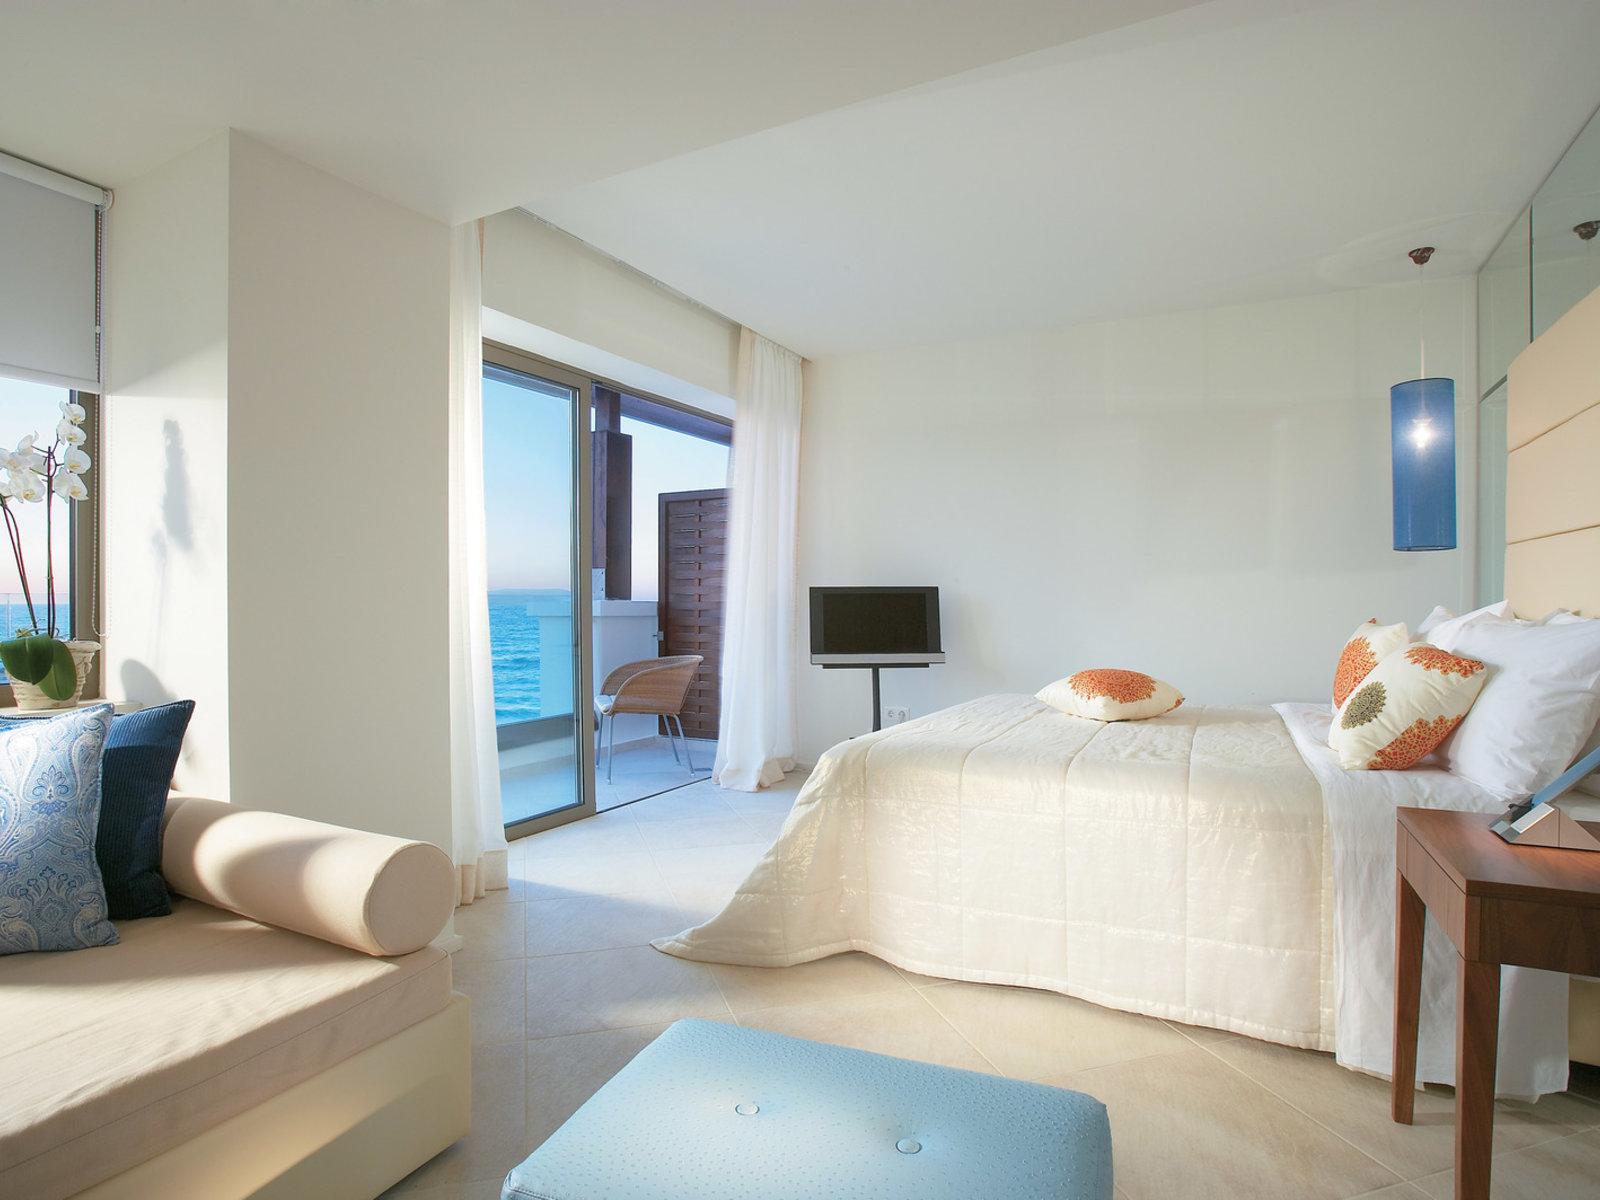 Wohnbeispiel luxury room with sea view